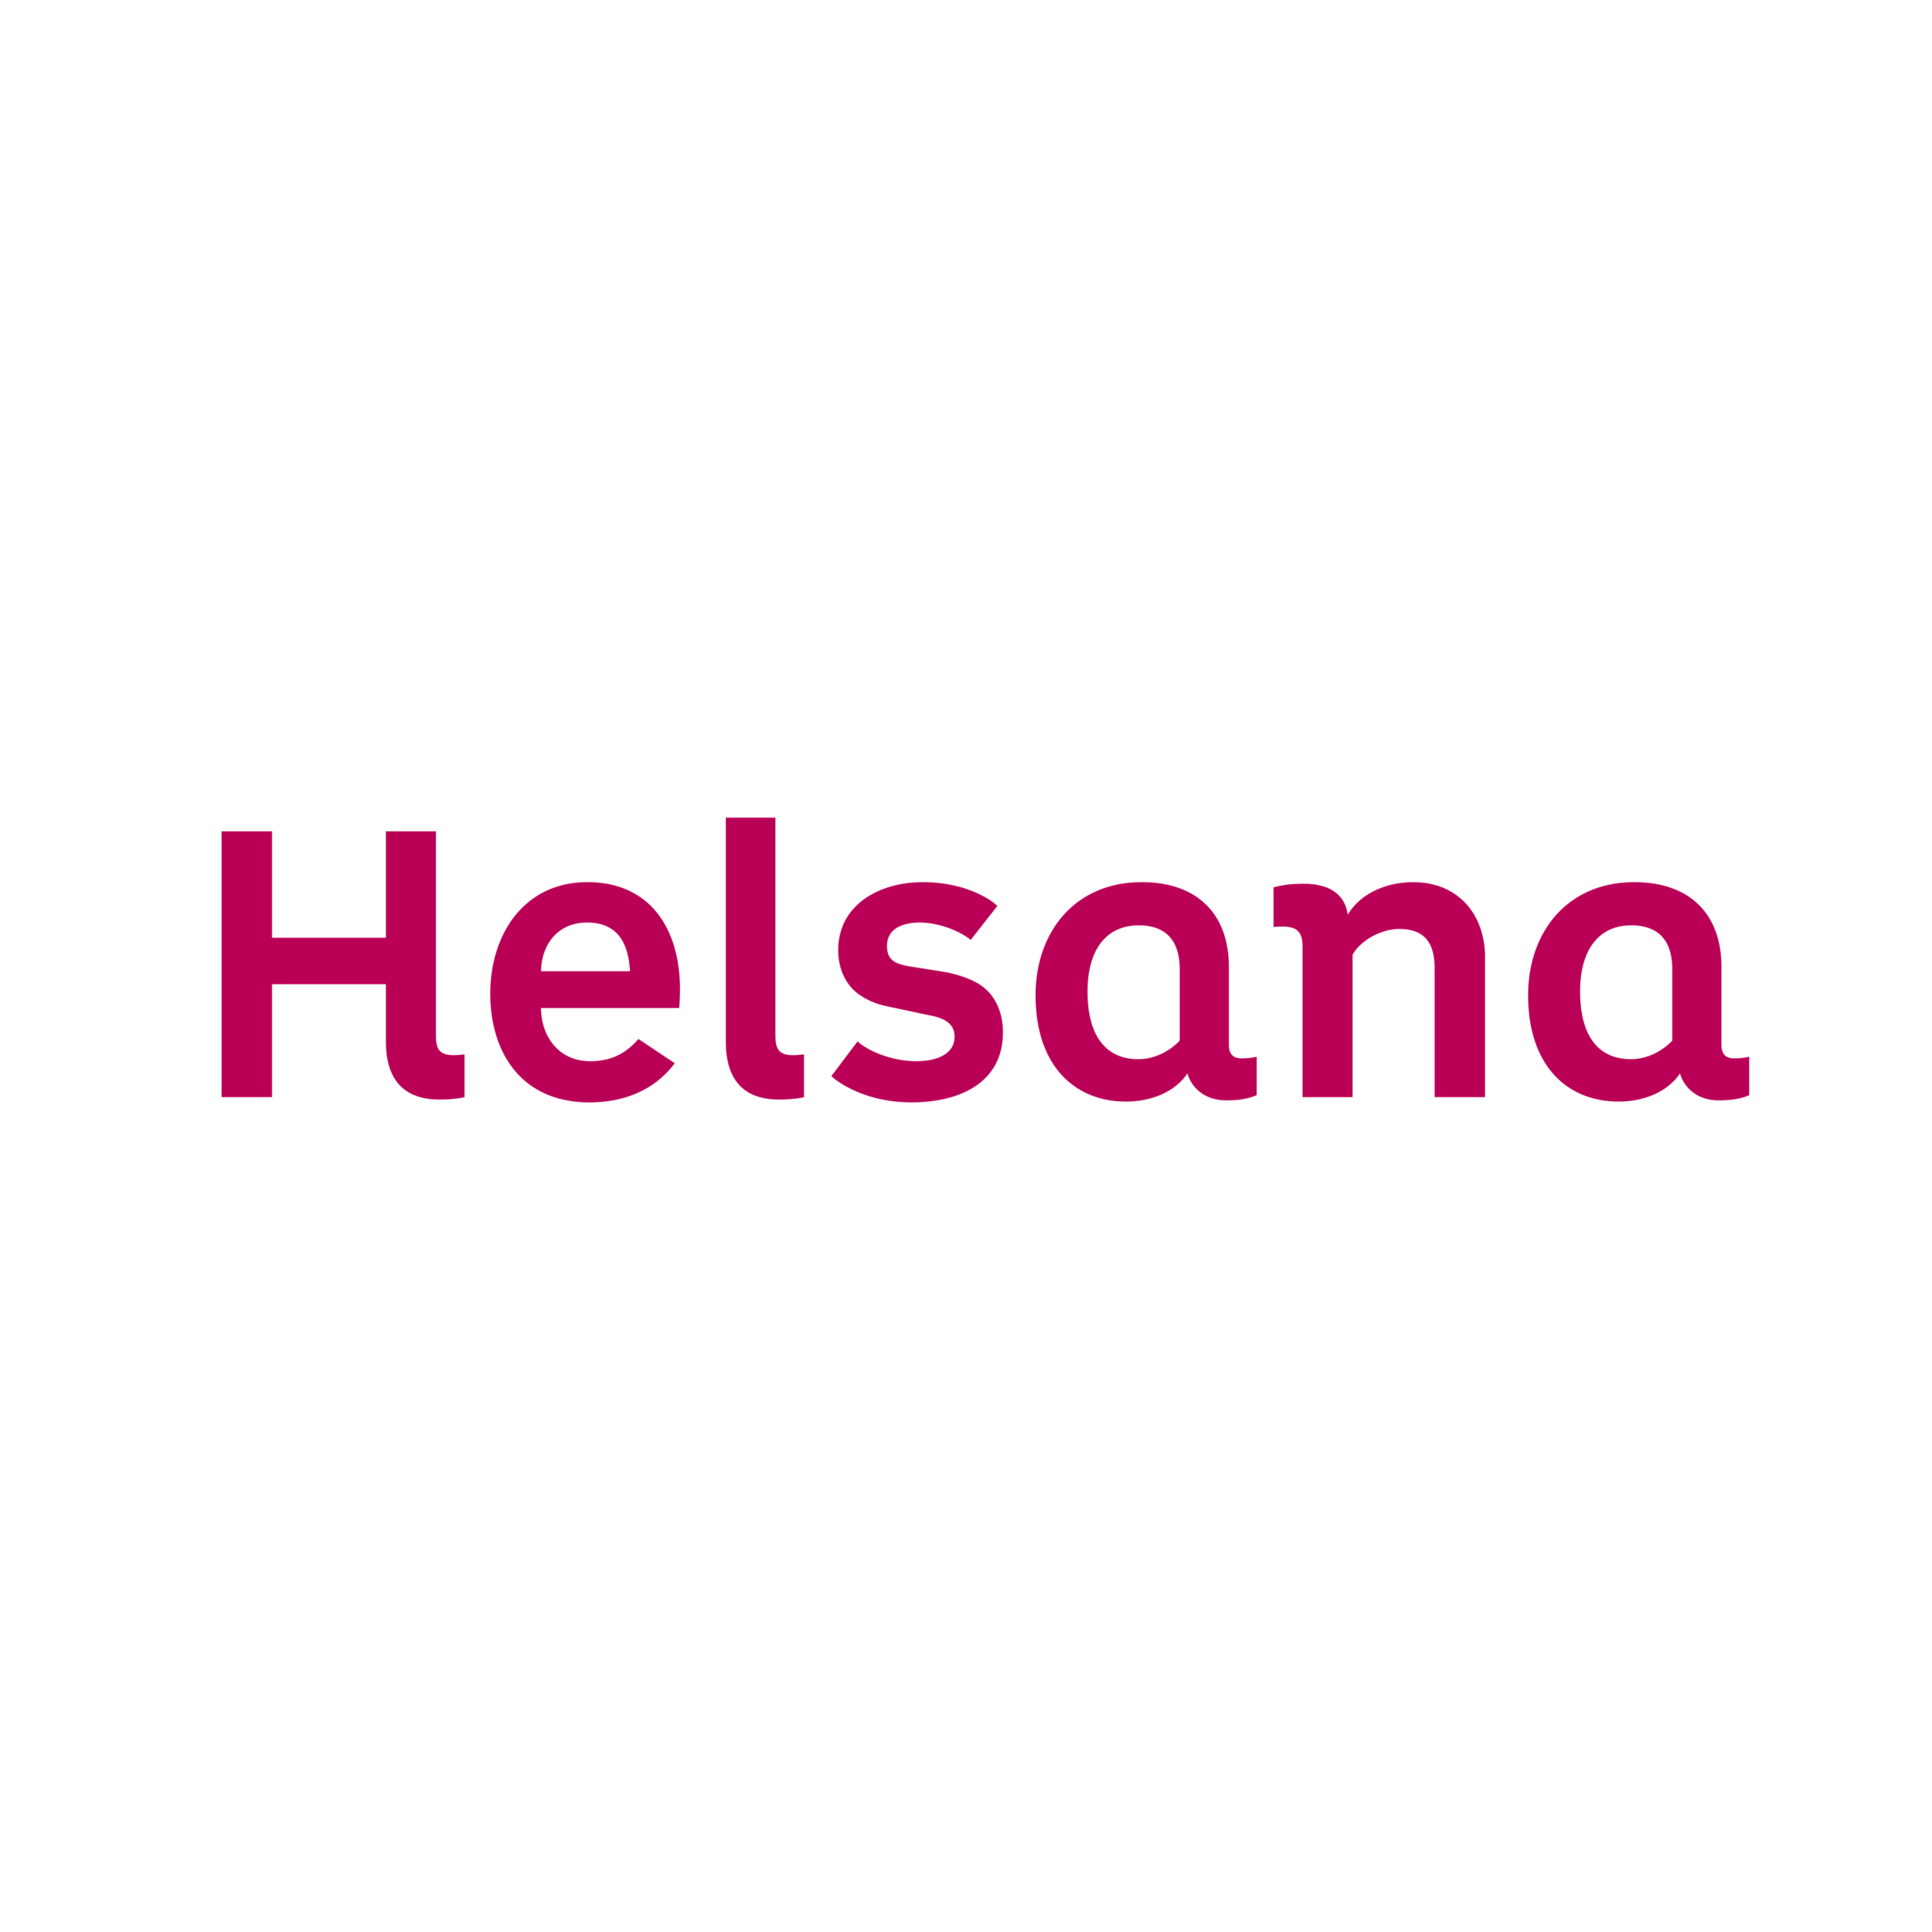 helsana.png